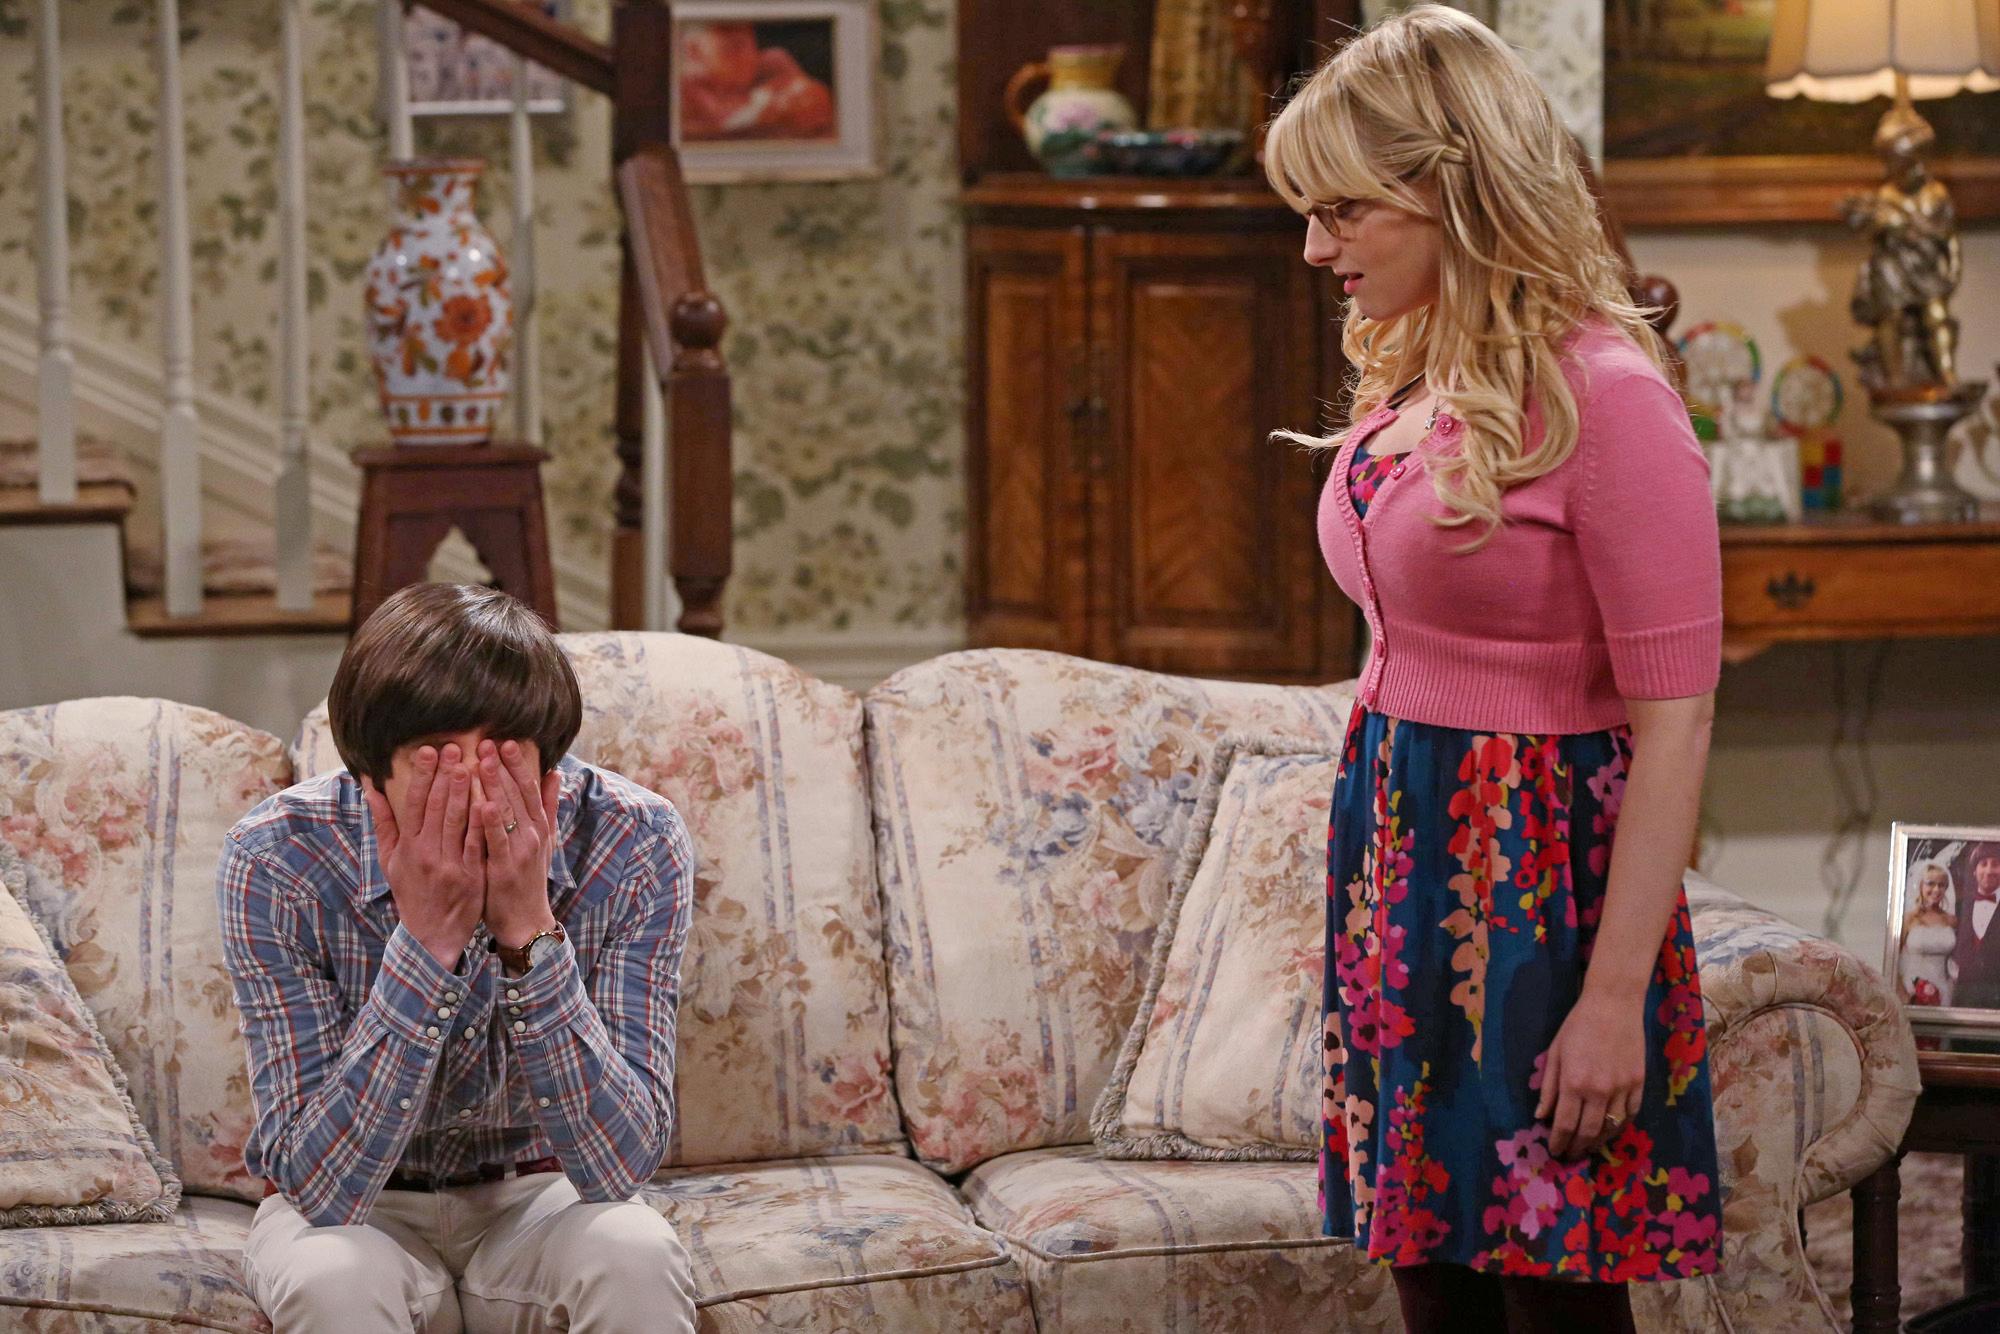 8. Bernadette Rostenkowski - The Big Bang Theory